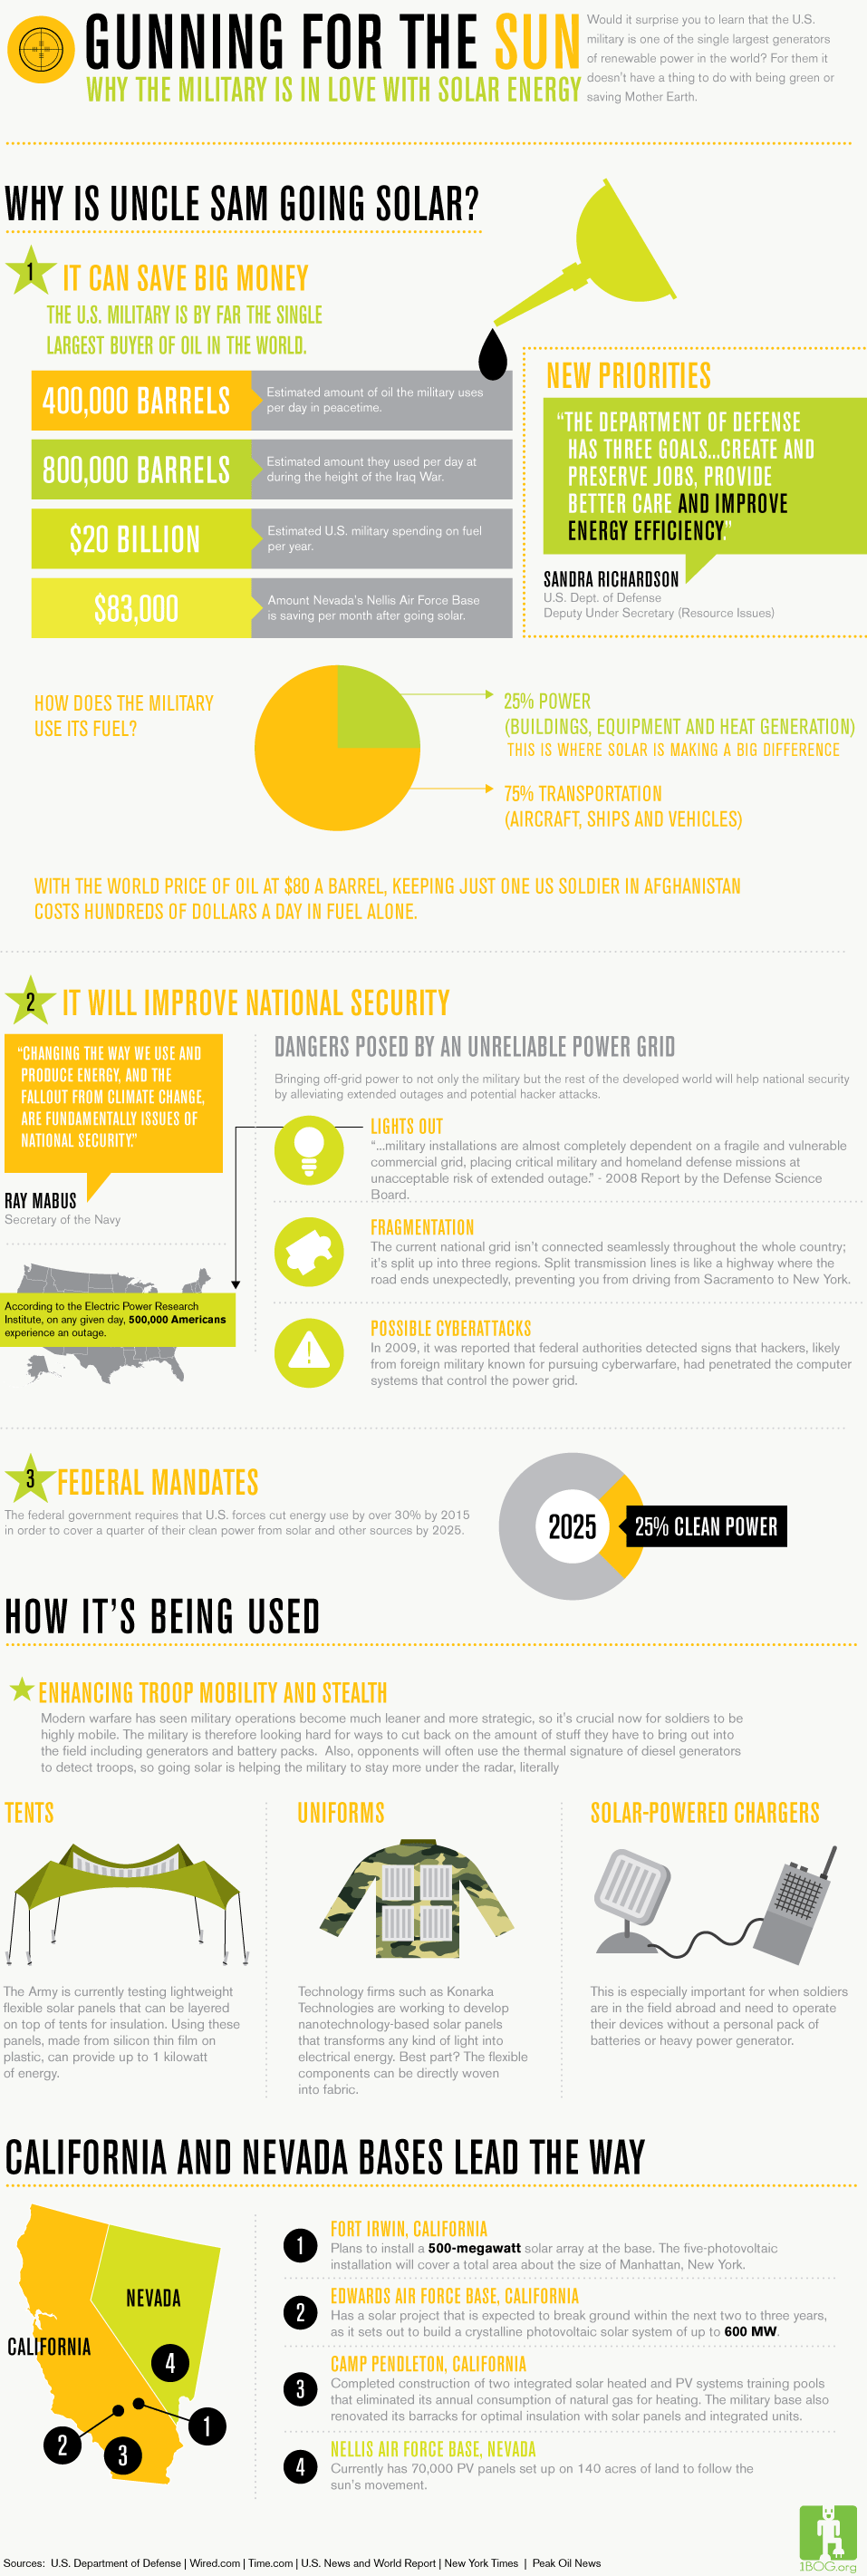 Military Solar: Why The Military Loves Solar Power